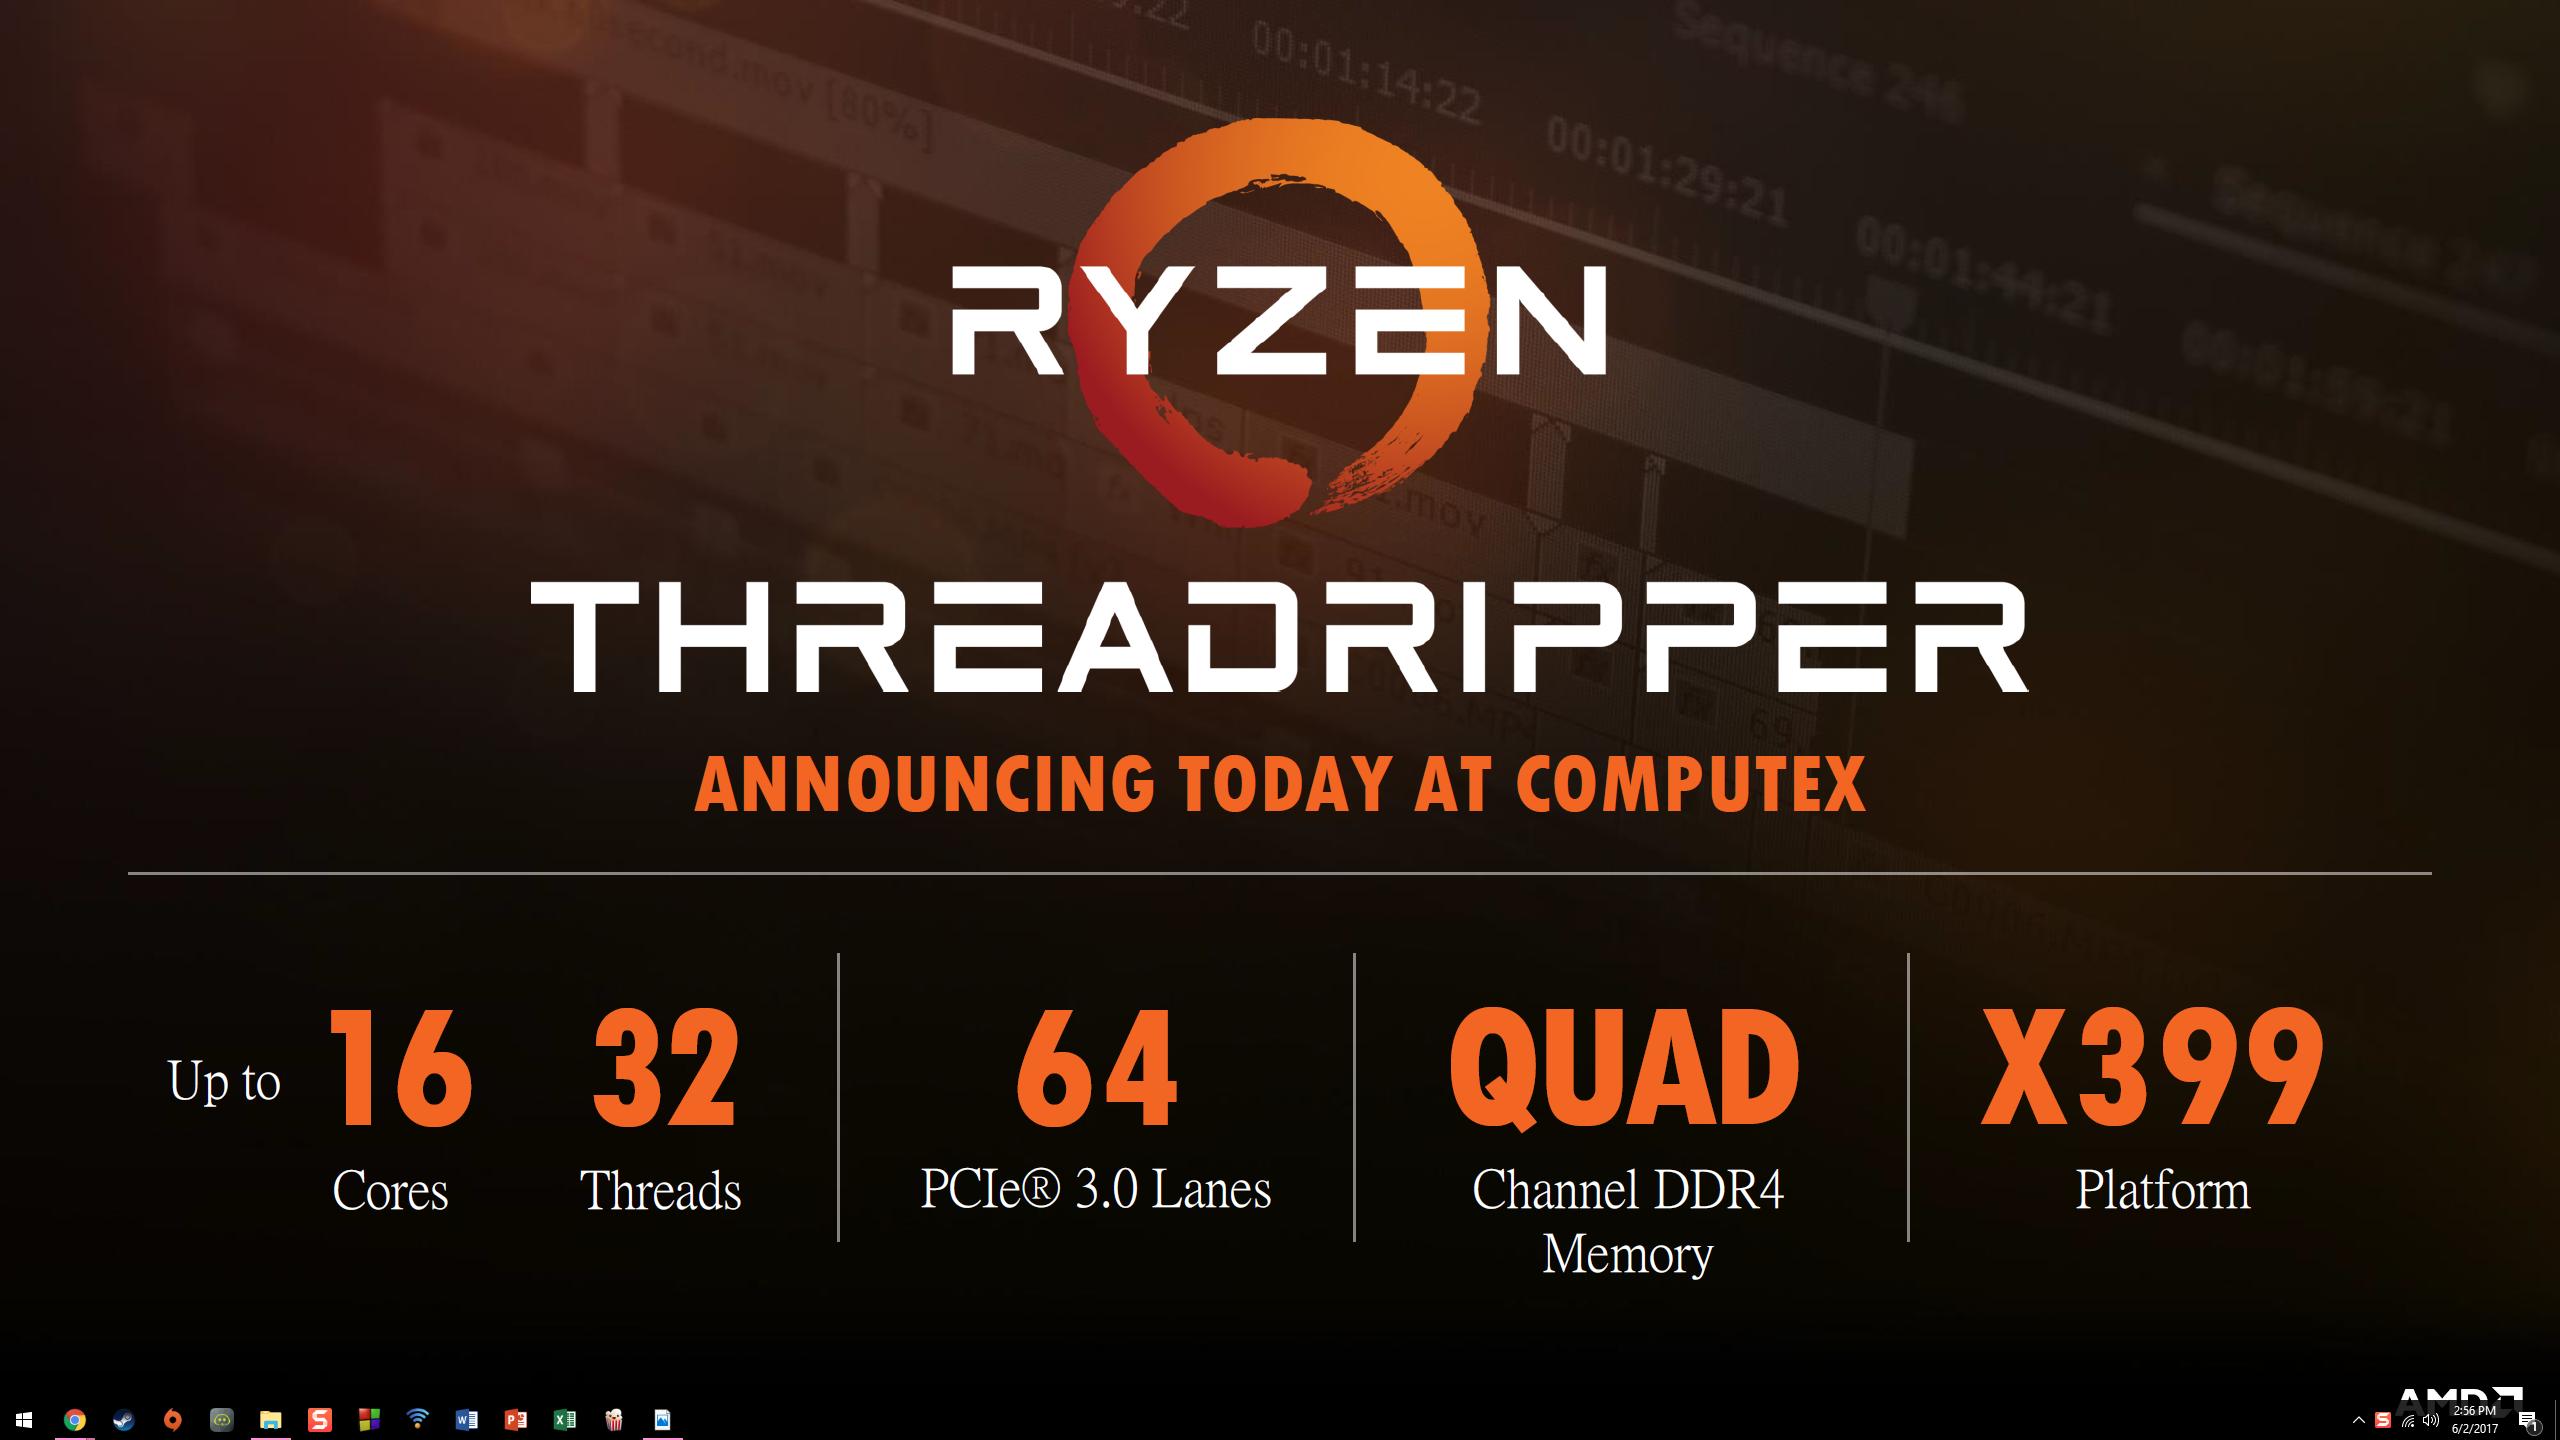 CPU AMD Ryzen Threadripper 1950X (3.4 Upto 4.0GHz/ 32MB/ 16 cores 32 threats/ TR4)